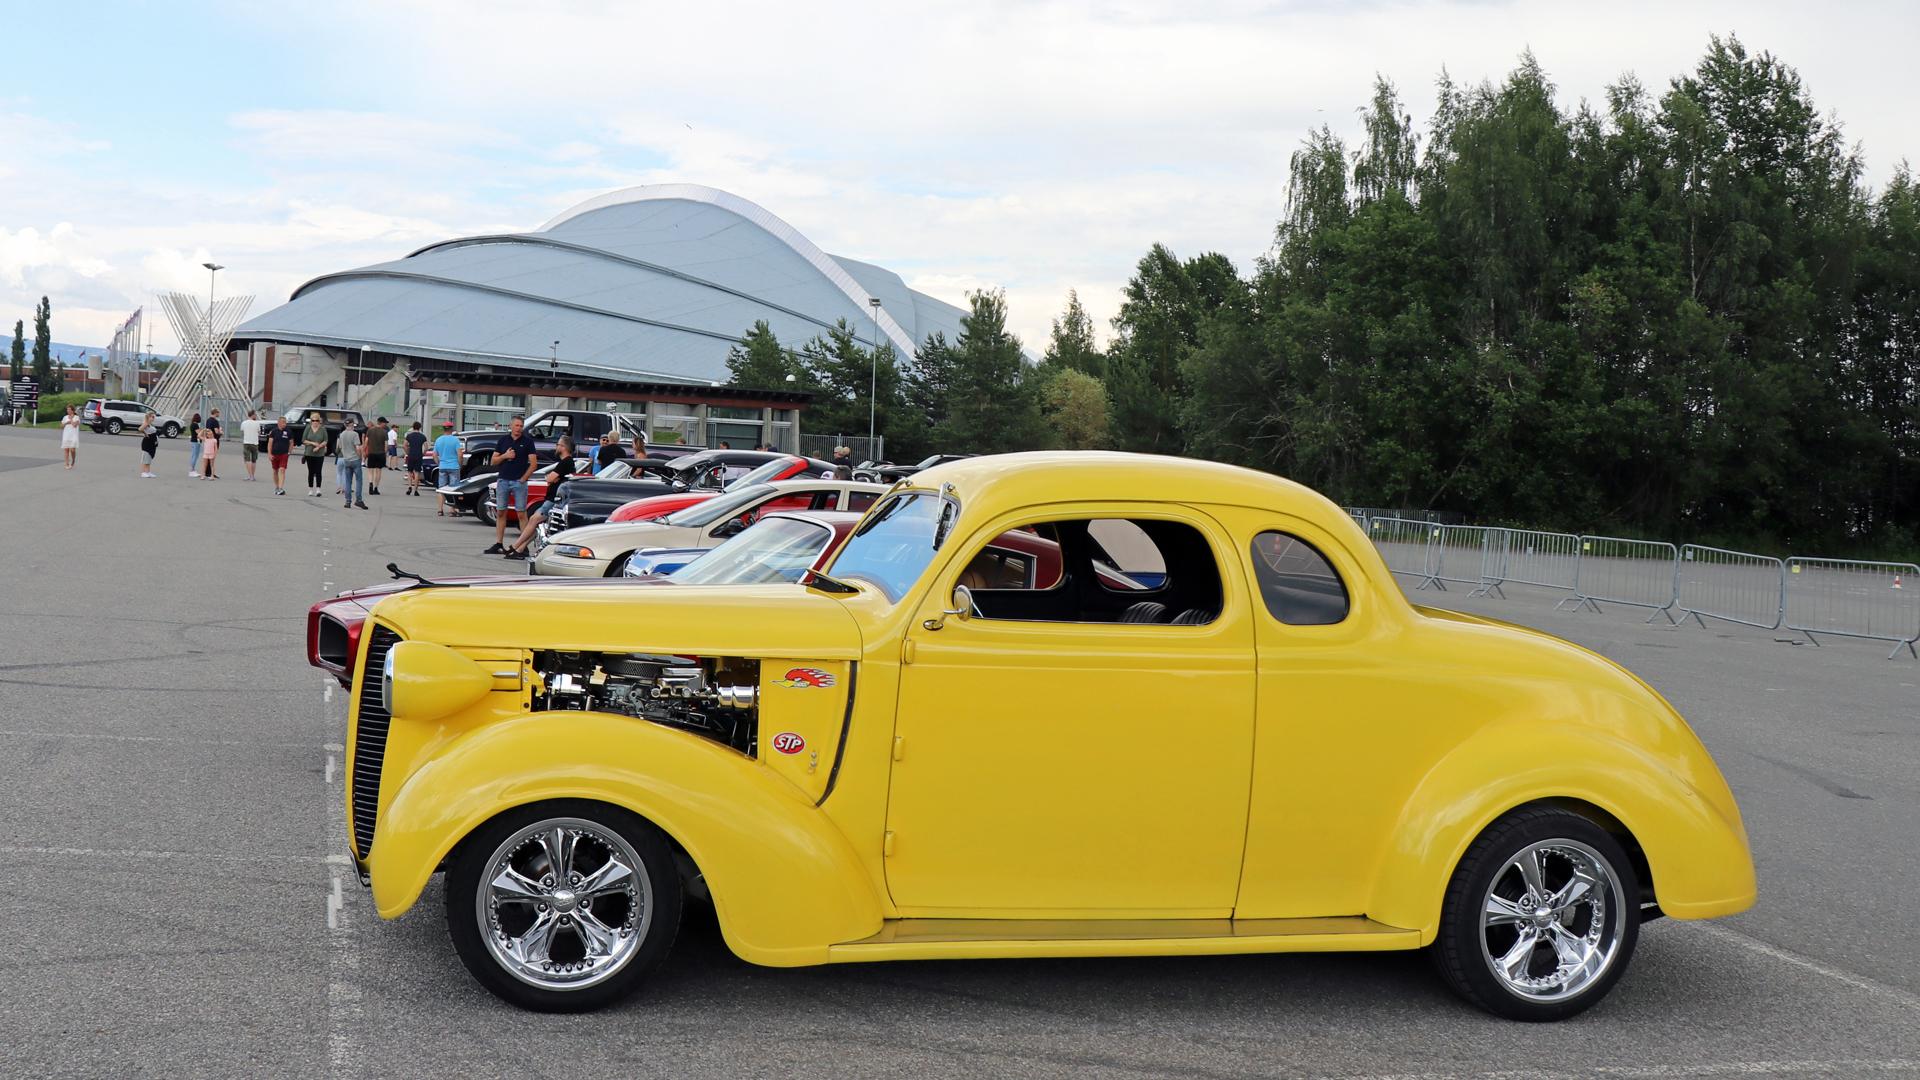 393-1937 Dodge Coupe 01. Eiere- medlem 393 Liz Hel